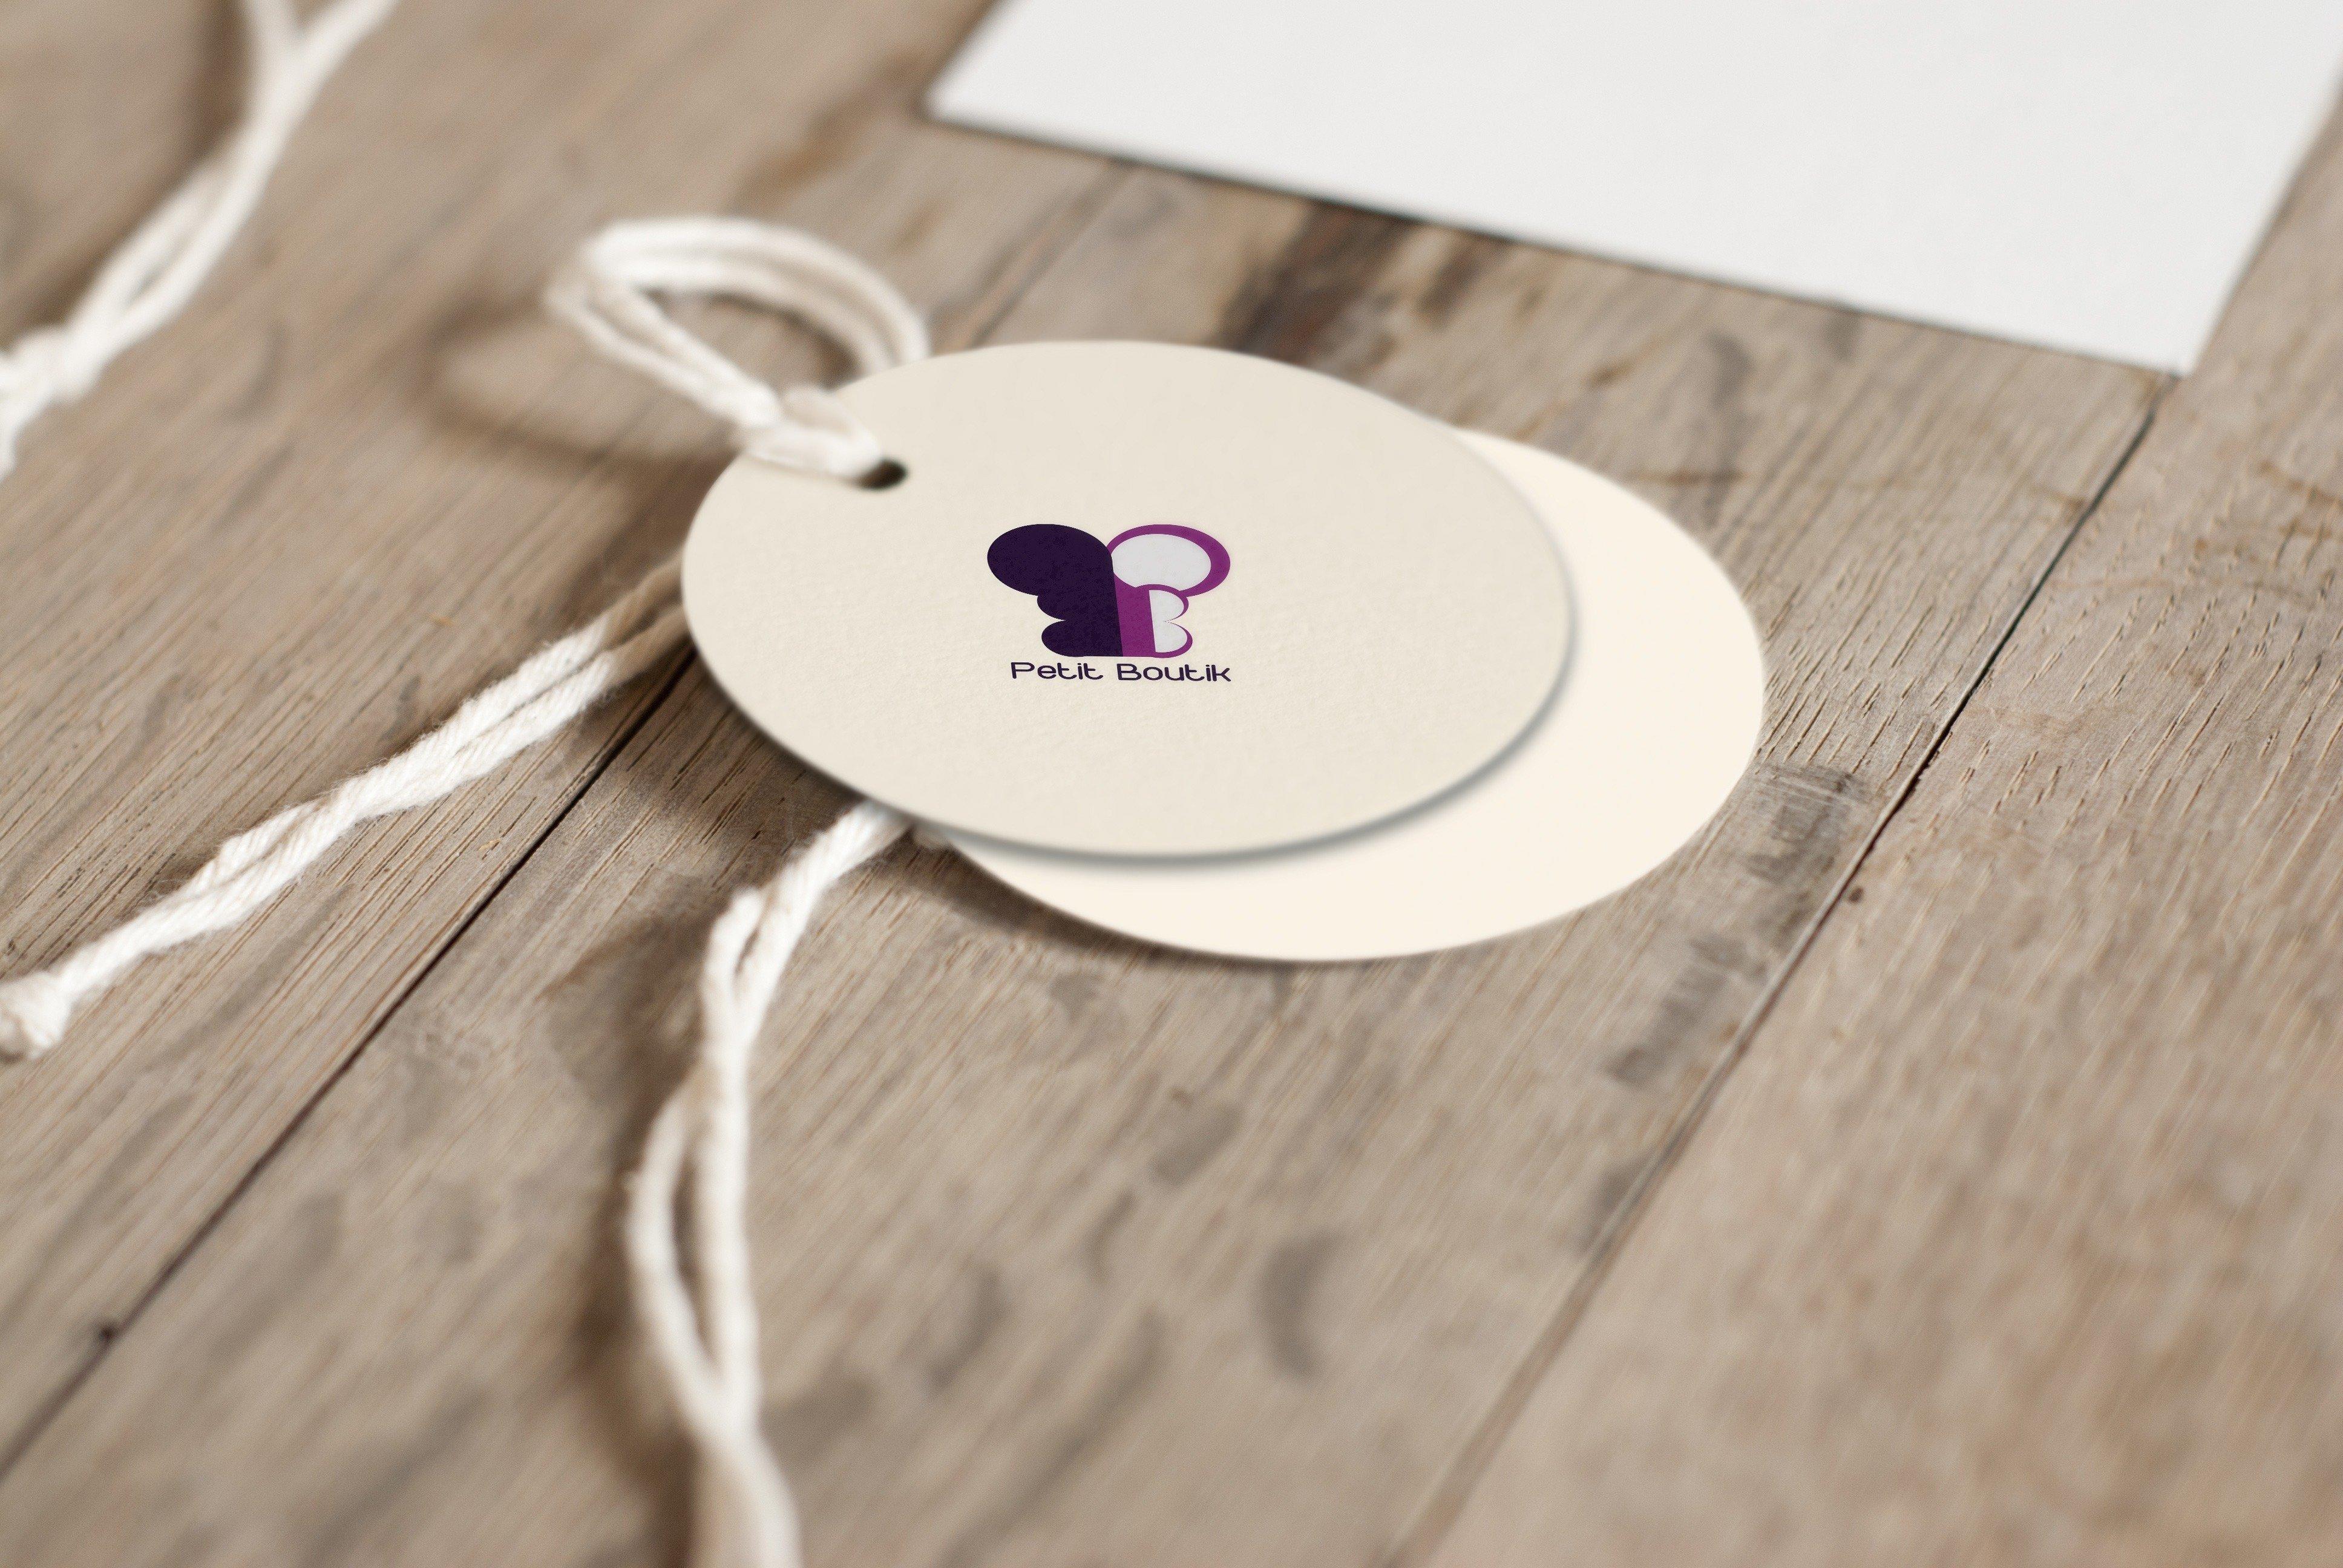 petit boutik logo label v2 by momenarts